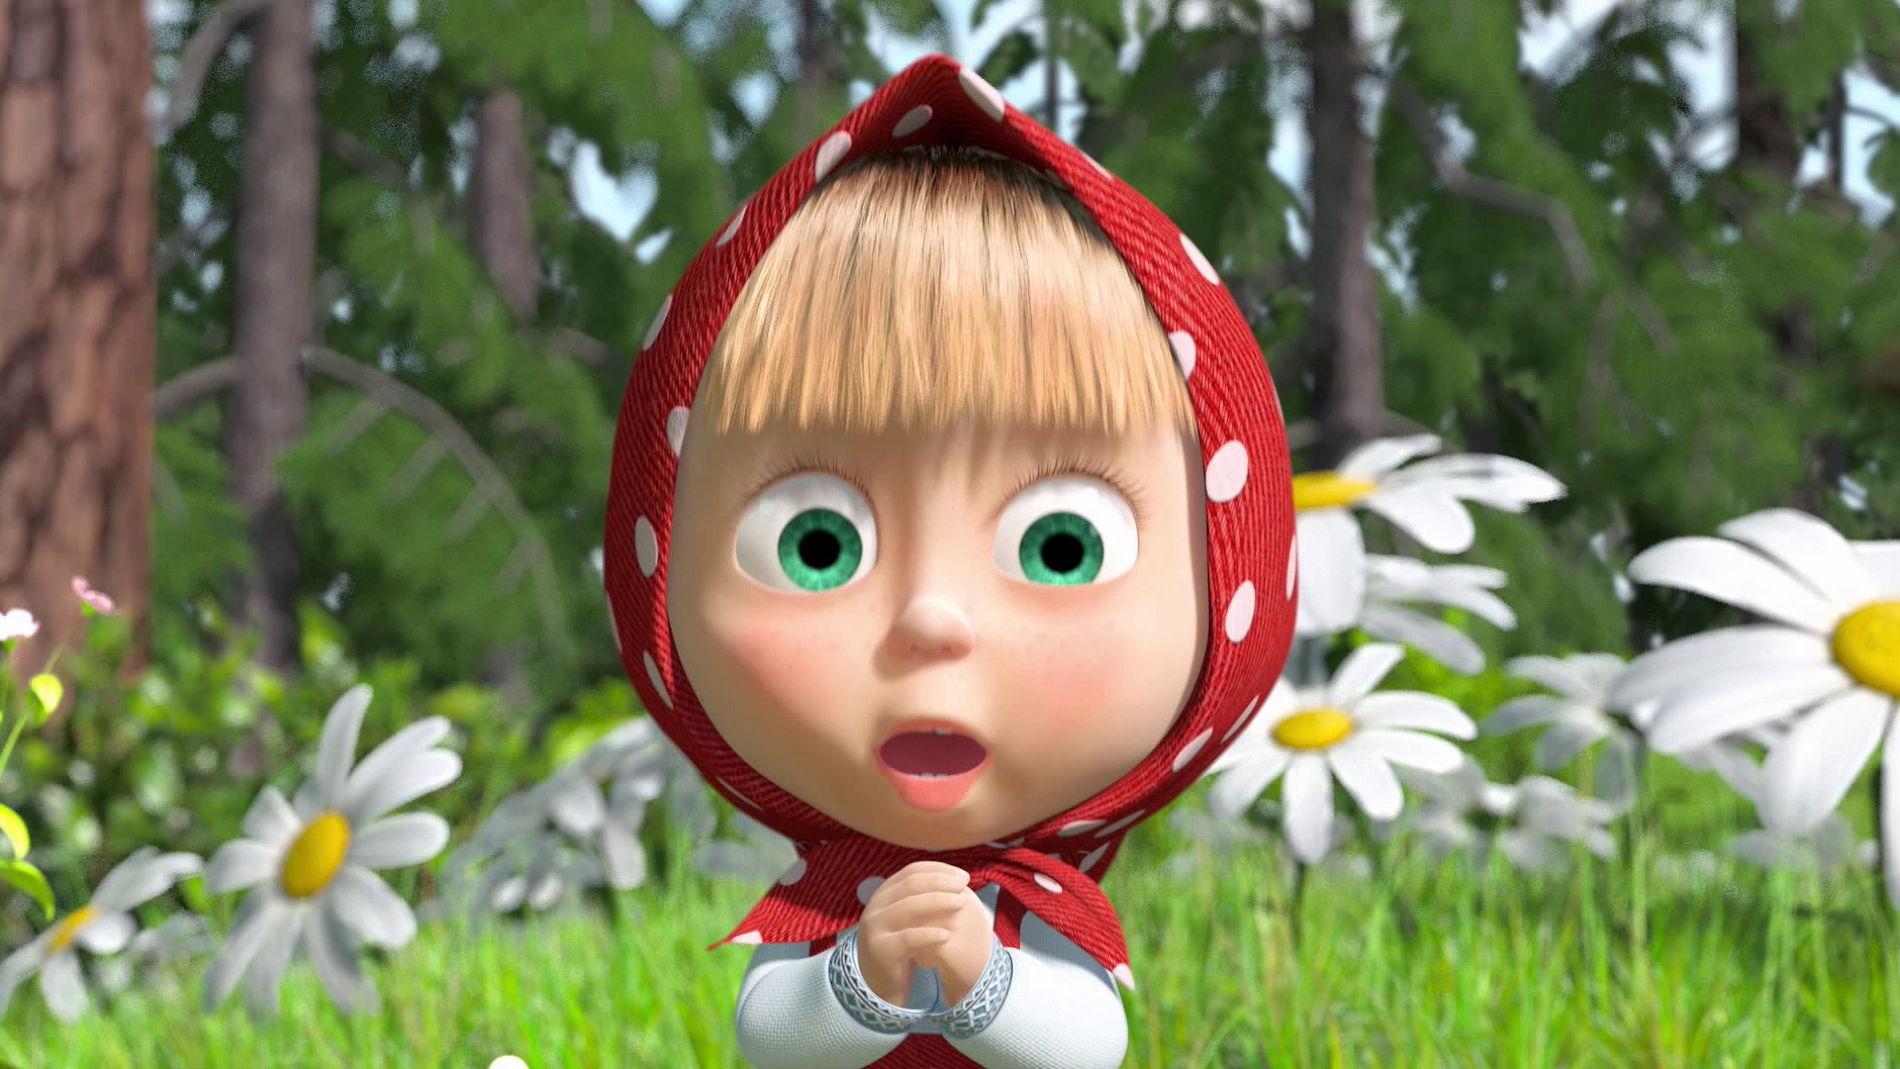 Смотреть онлайн мультик Моана 2016